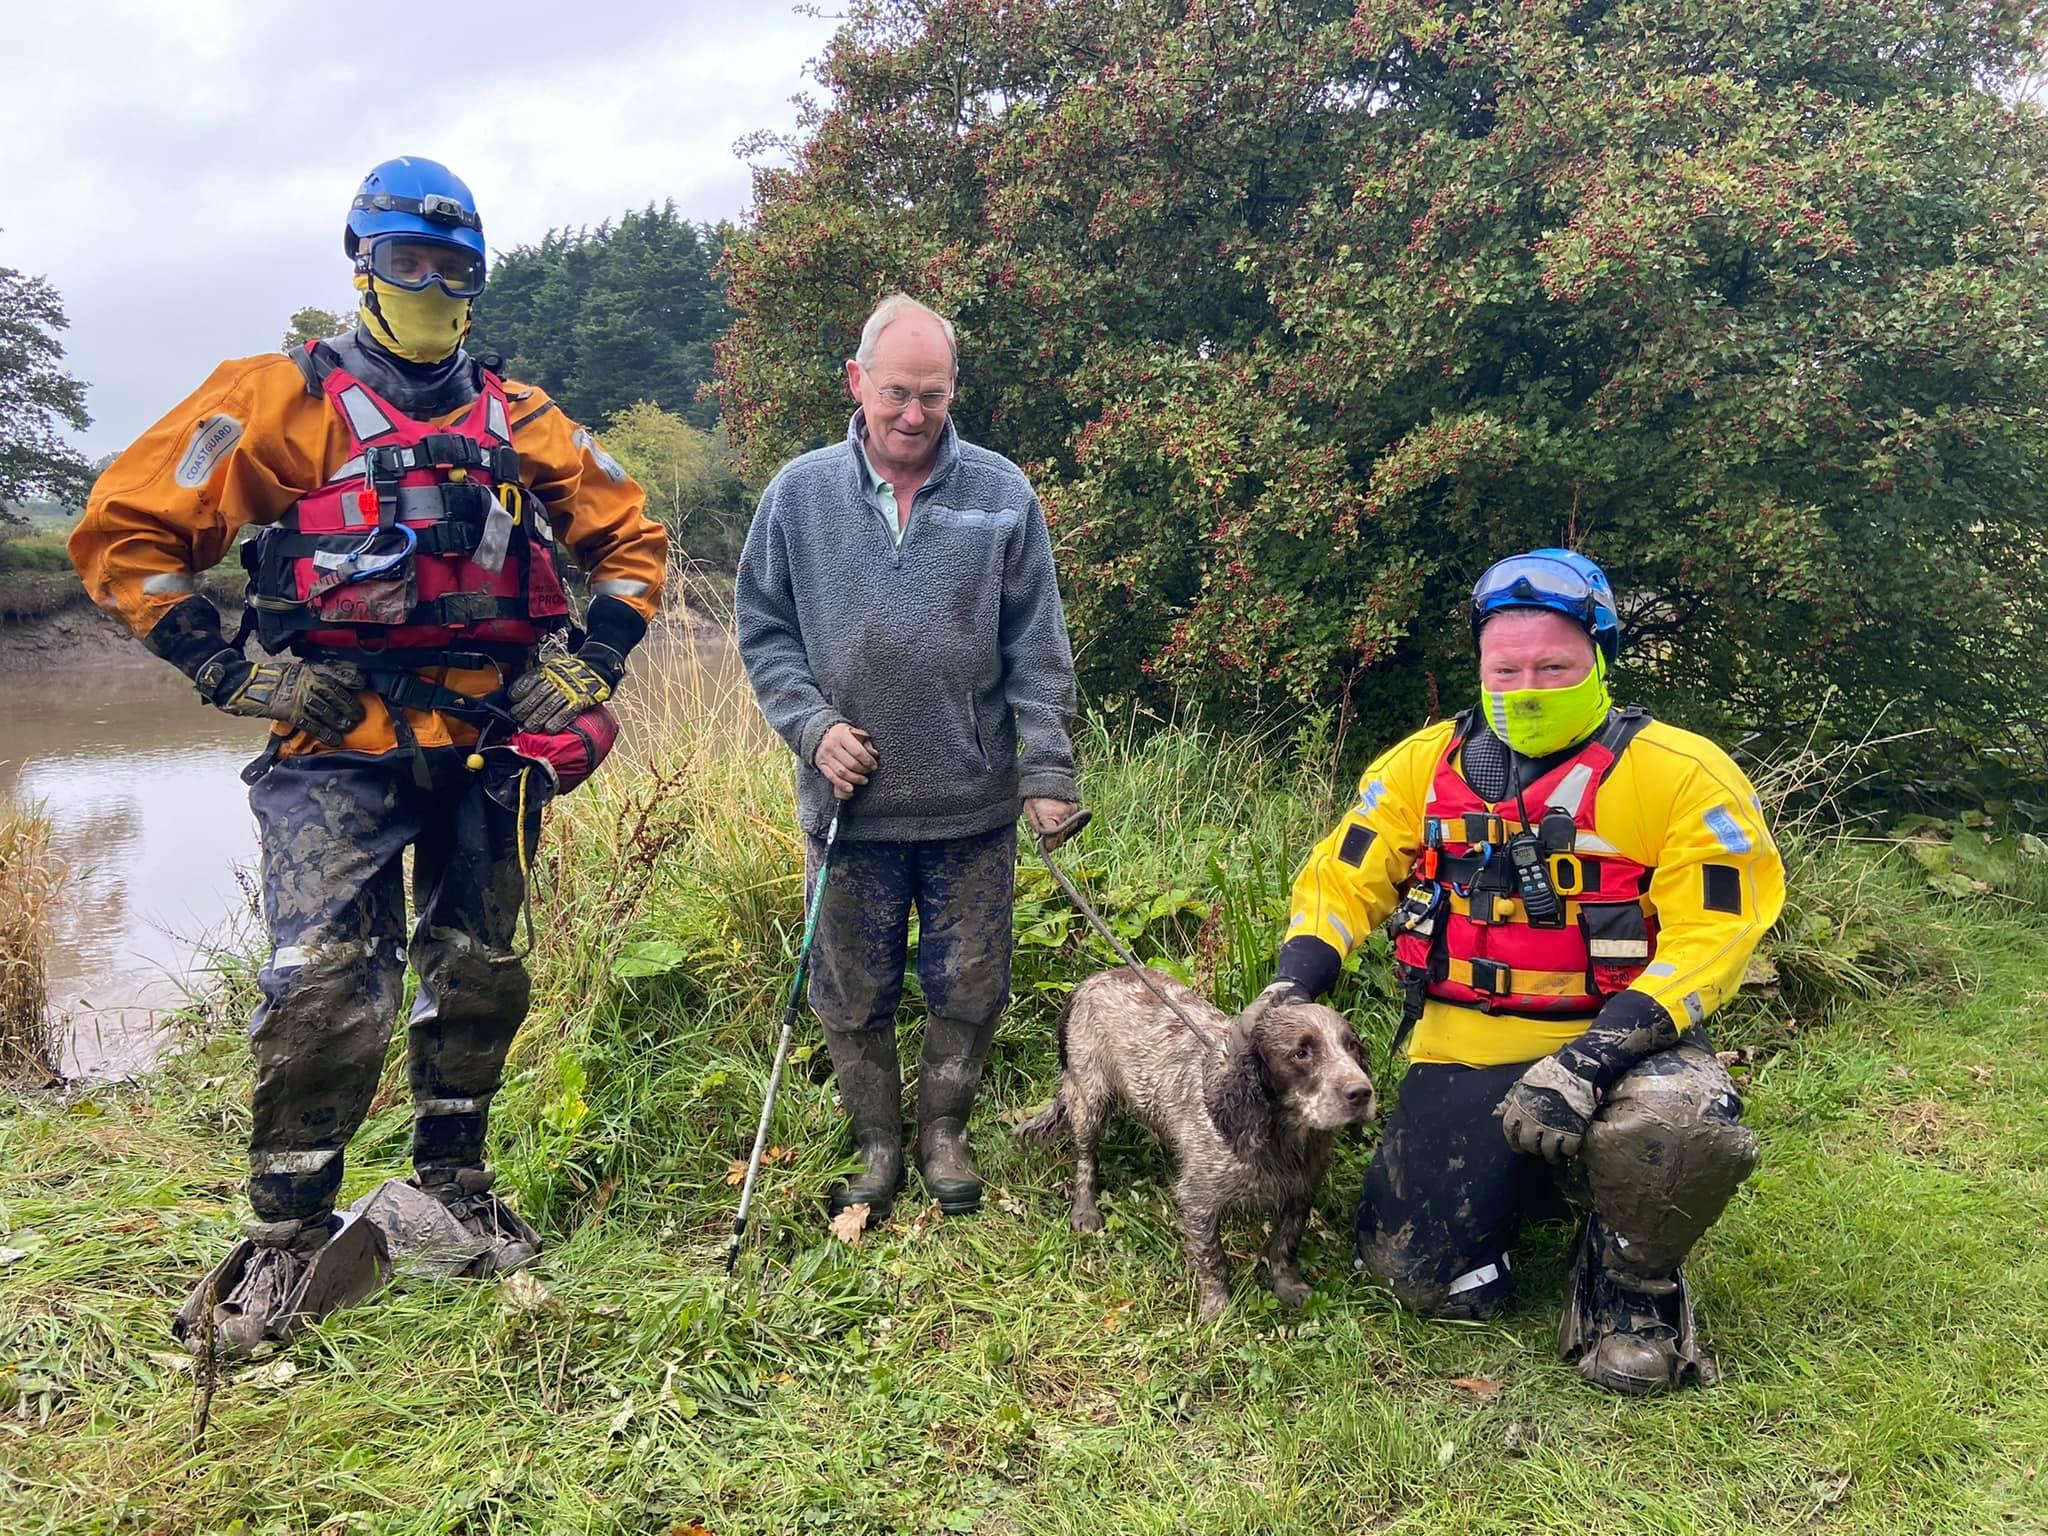 Coastguard to the rescue of stuck dog